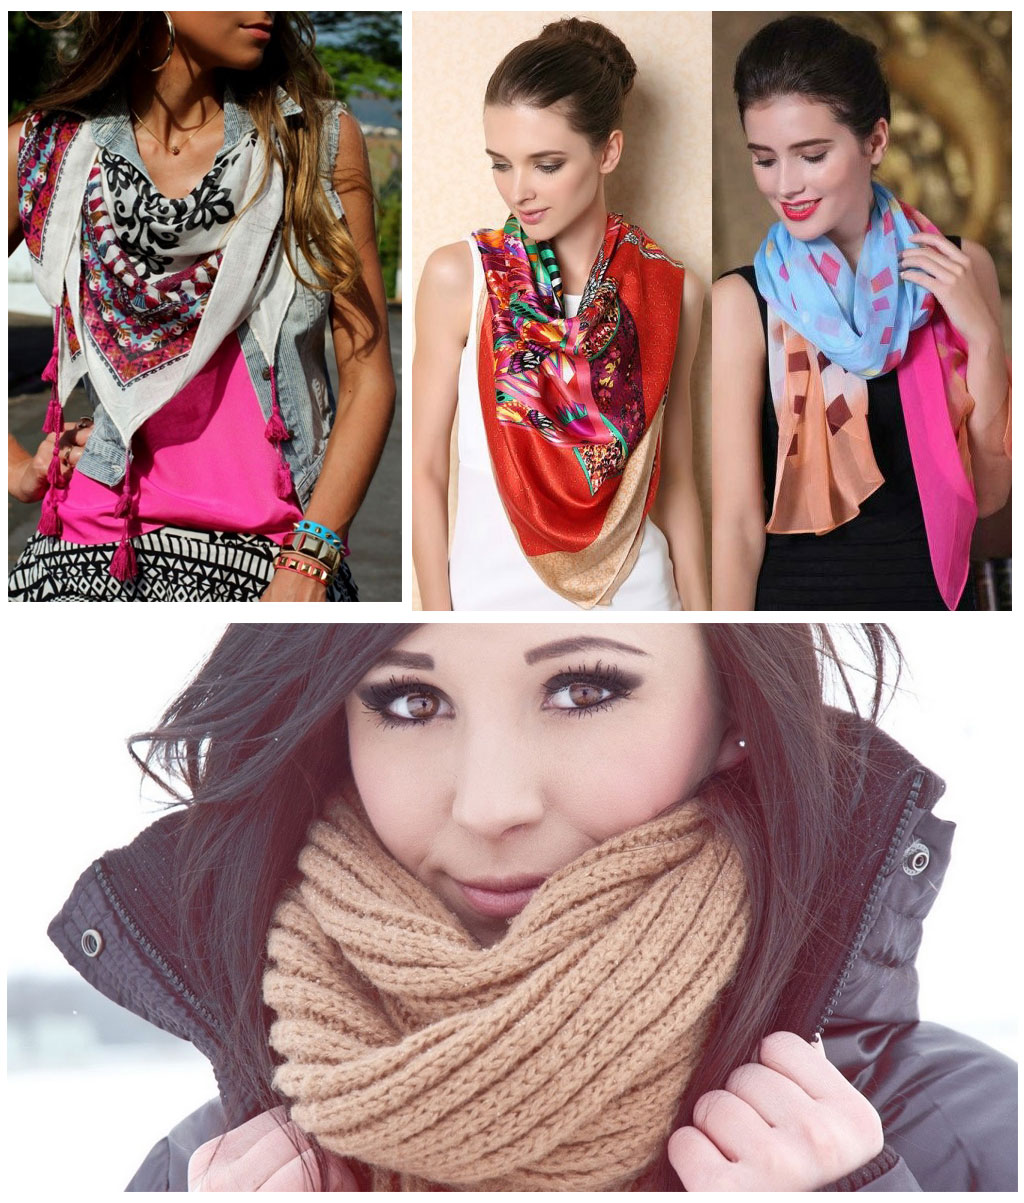 scarf wardrobe essentials for women - scarf - Must have wardrobe essentials for women